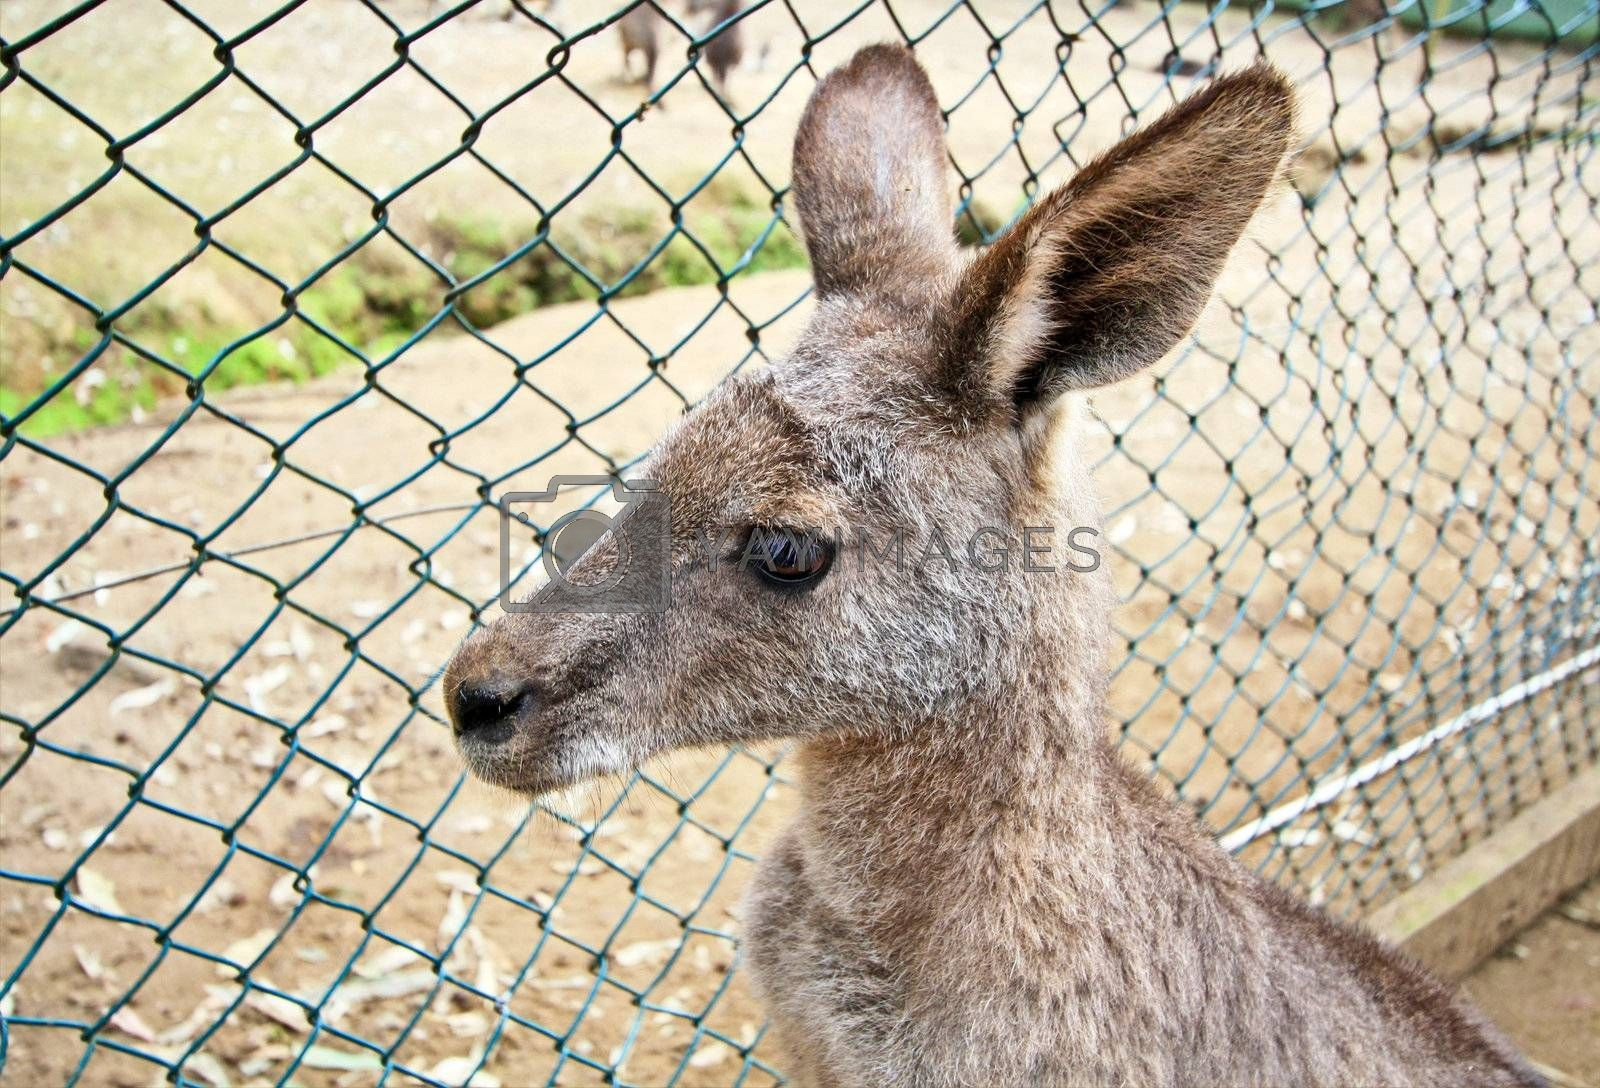 Kangaroo in cage of zoo